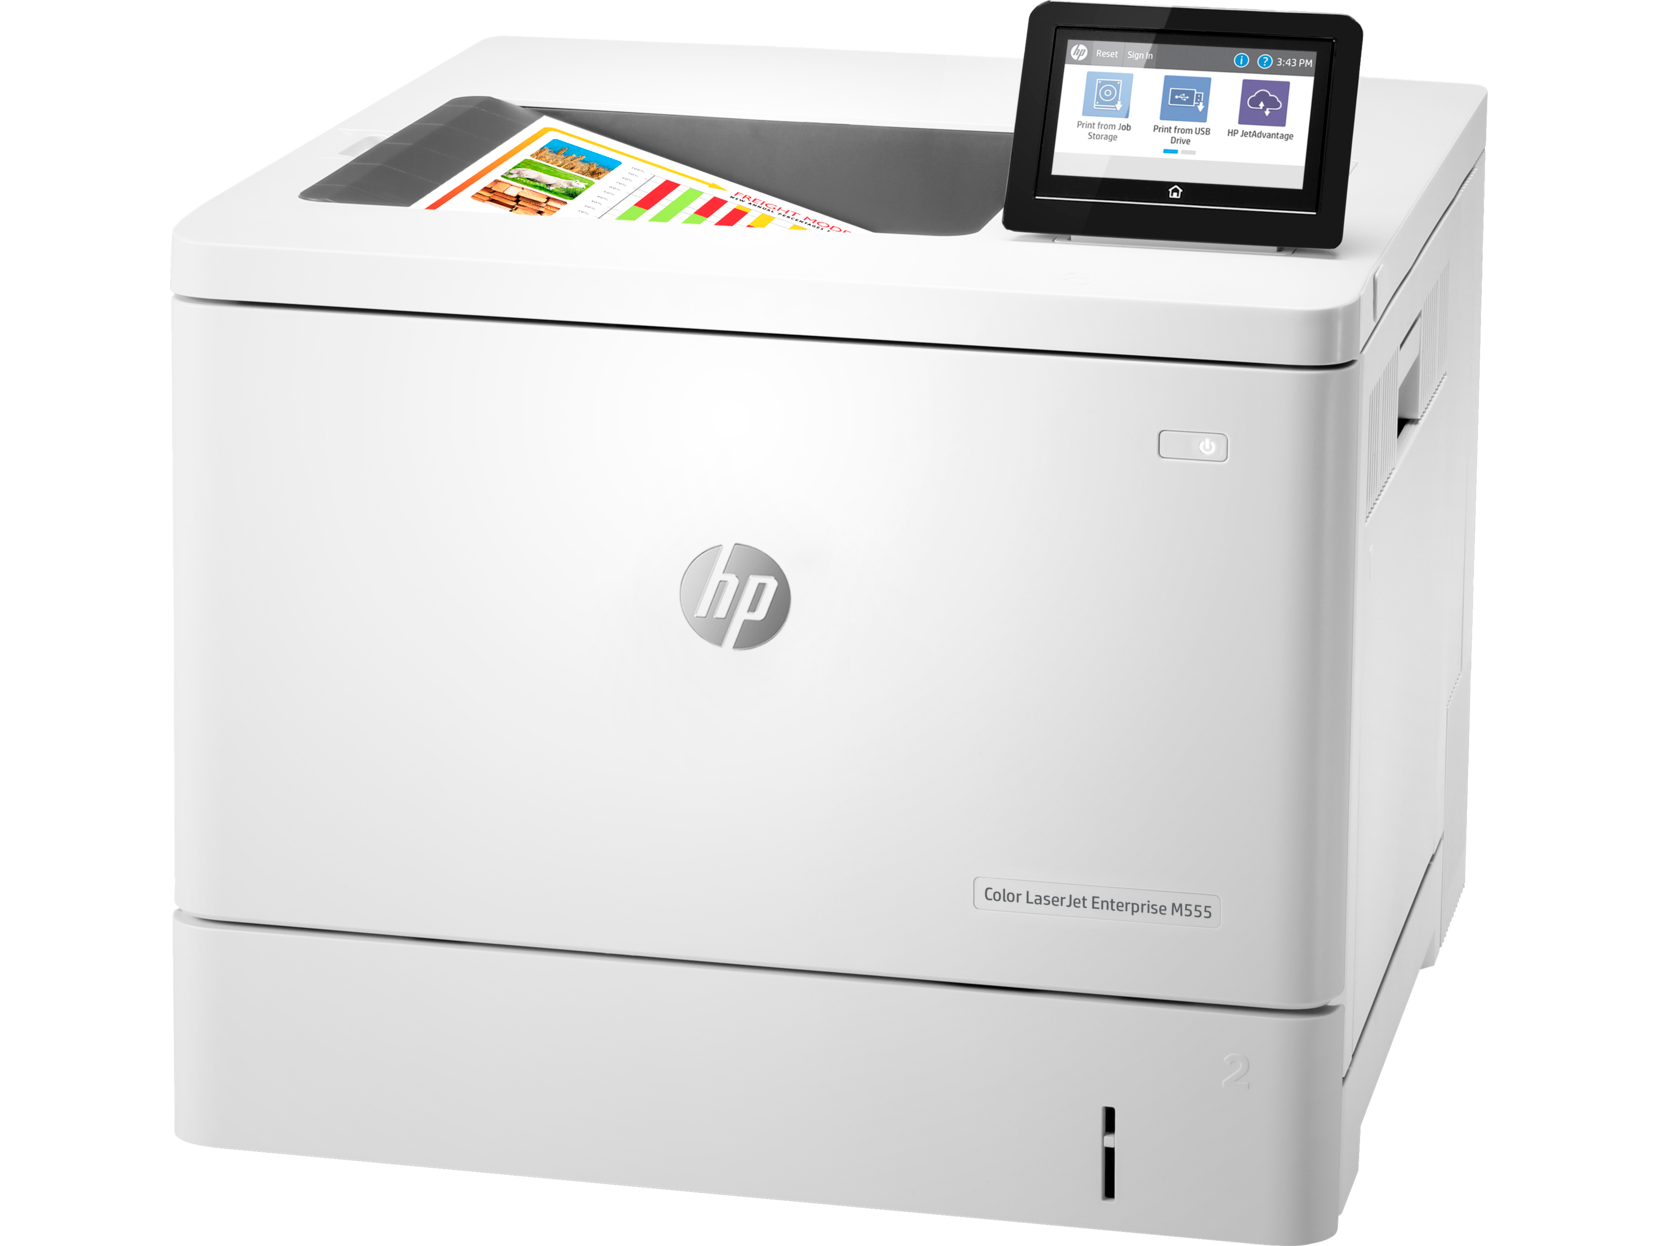 طابعة اتش بي ليزر جت HP Color LaserJet Enterprise M555dn بالألوان